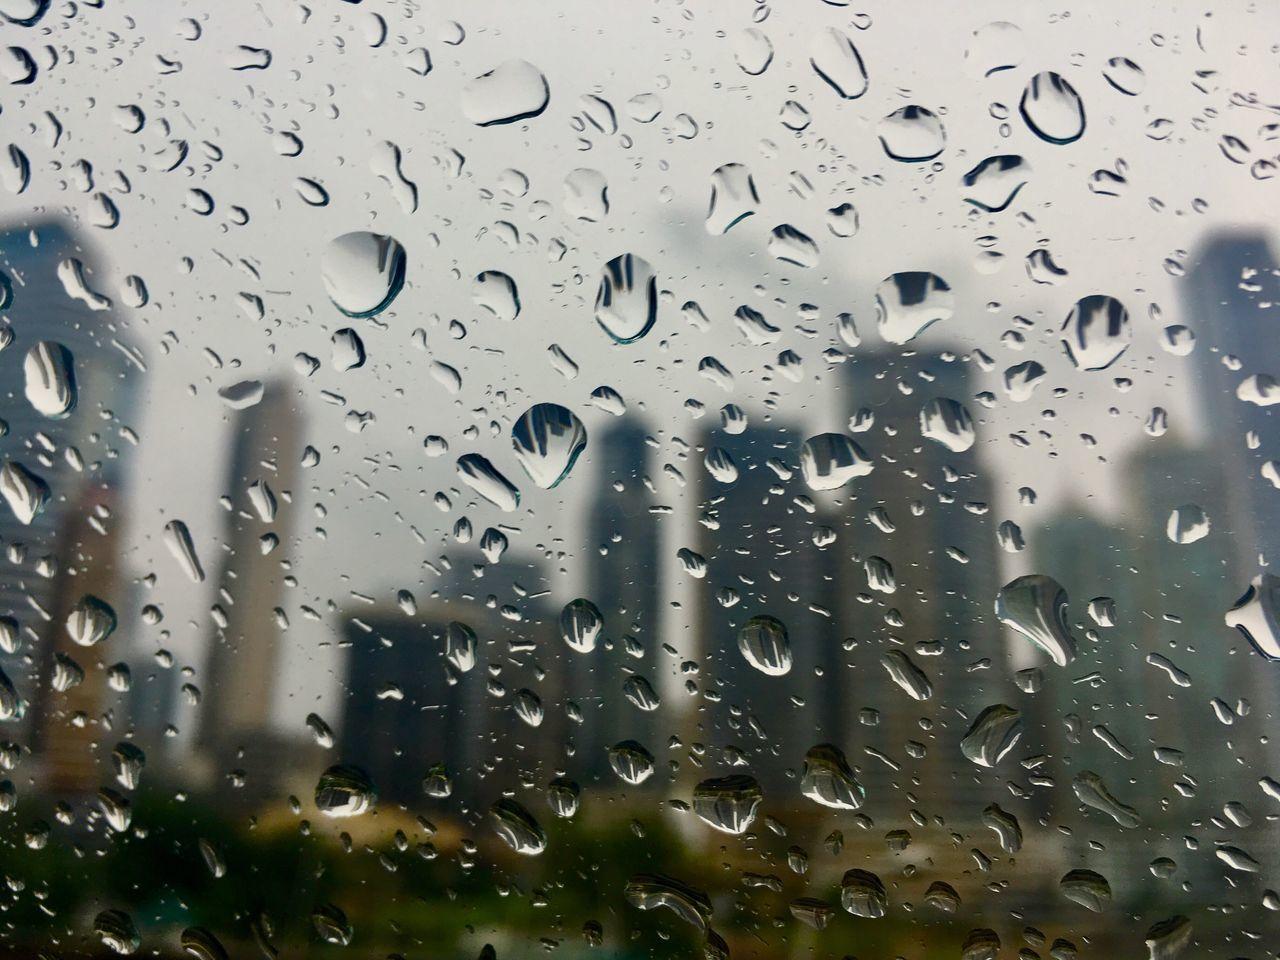 Panama City Rainy Days Rain Day Throuhg The Window Carwindow